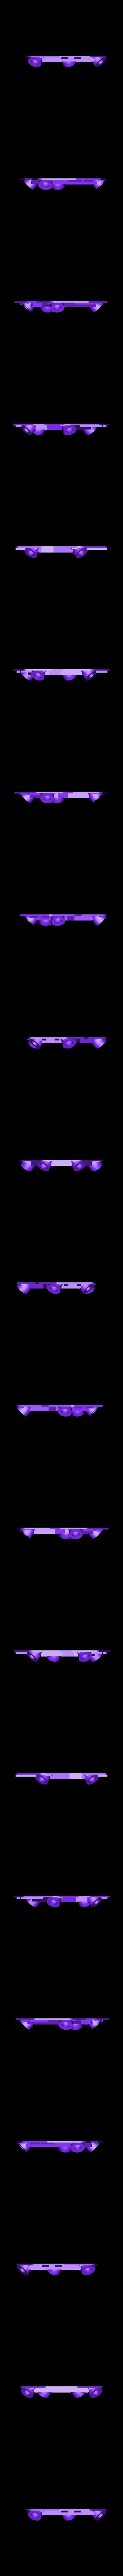 controller plate (1pcs).STL Download STL file Folding Quadcopter 450 Frame • 3D print object, AleksandrDolzhenko